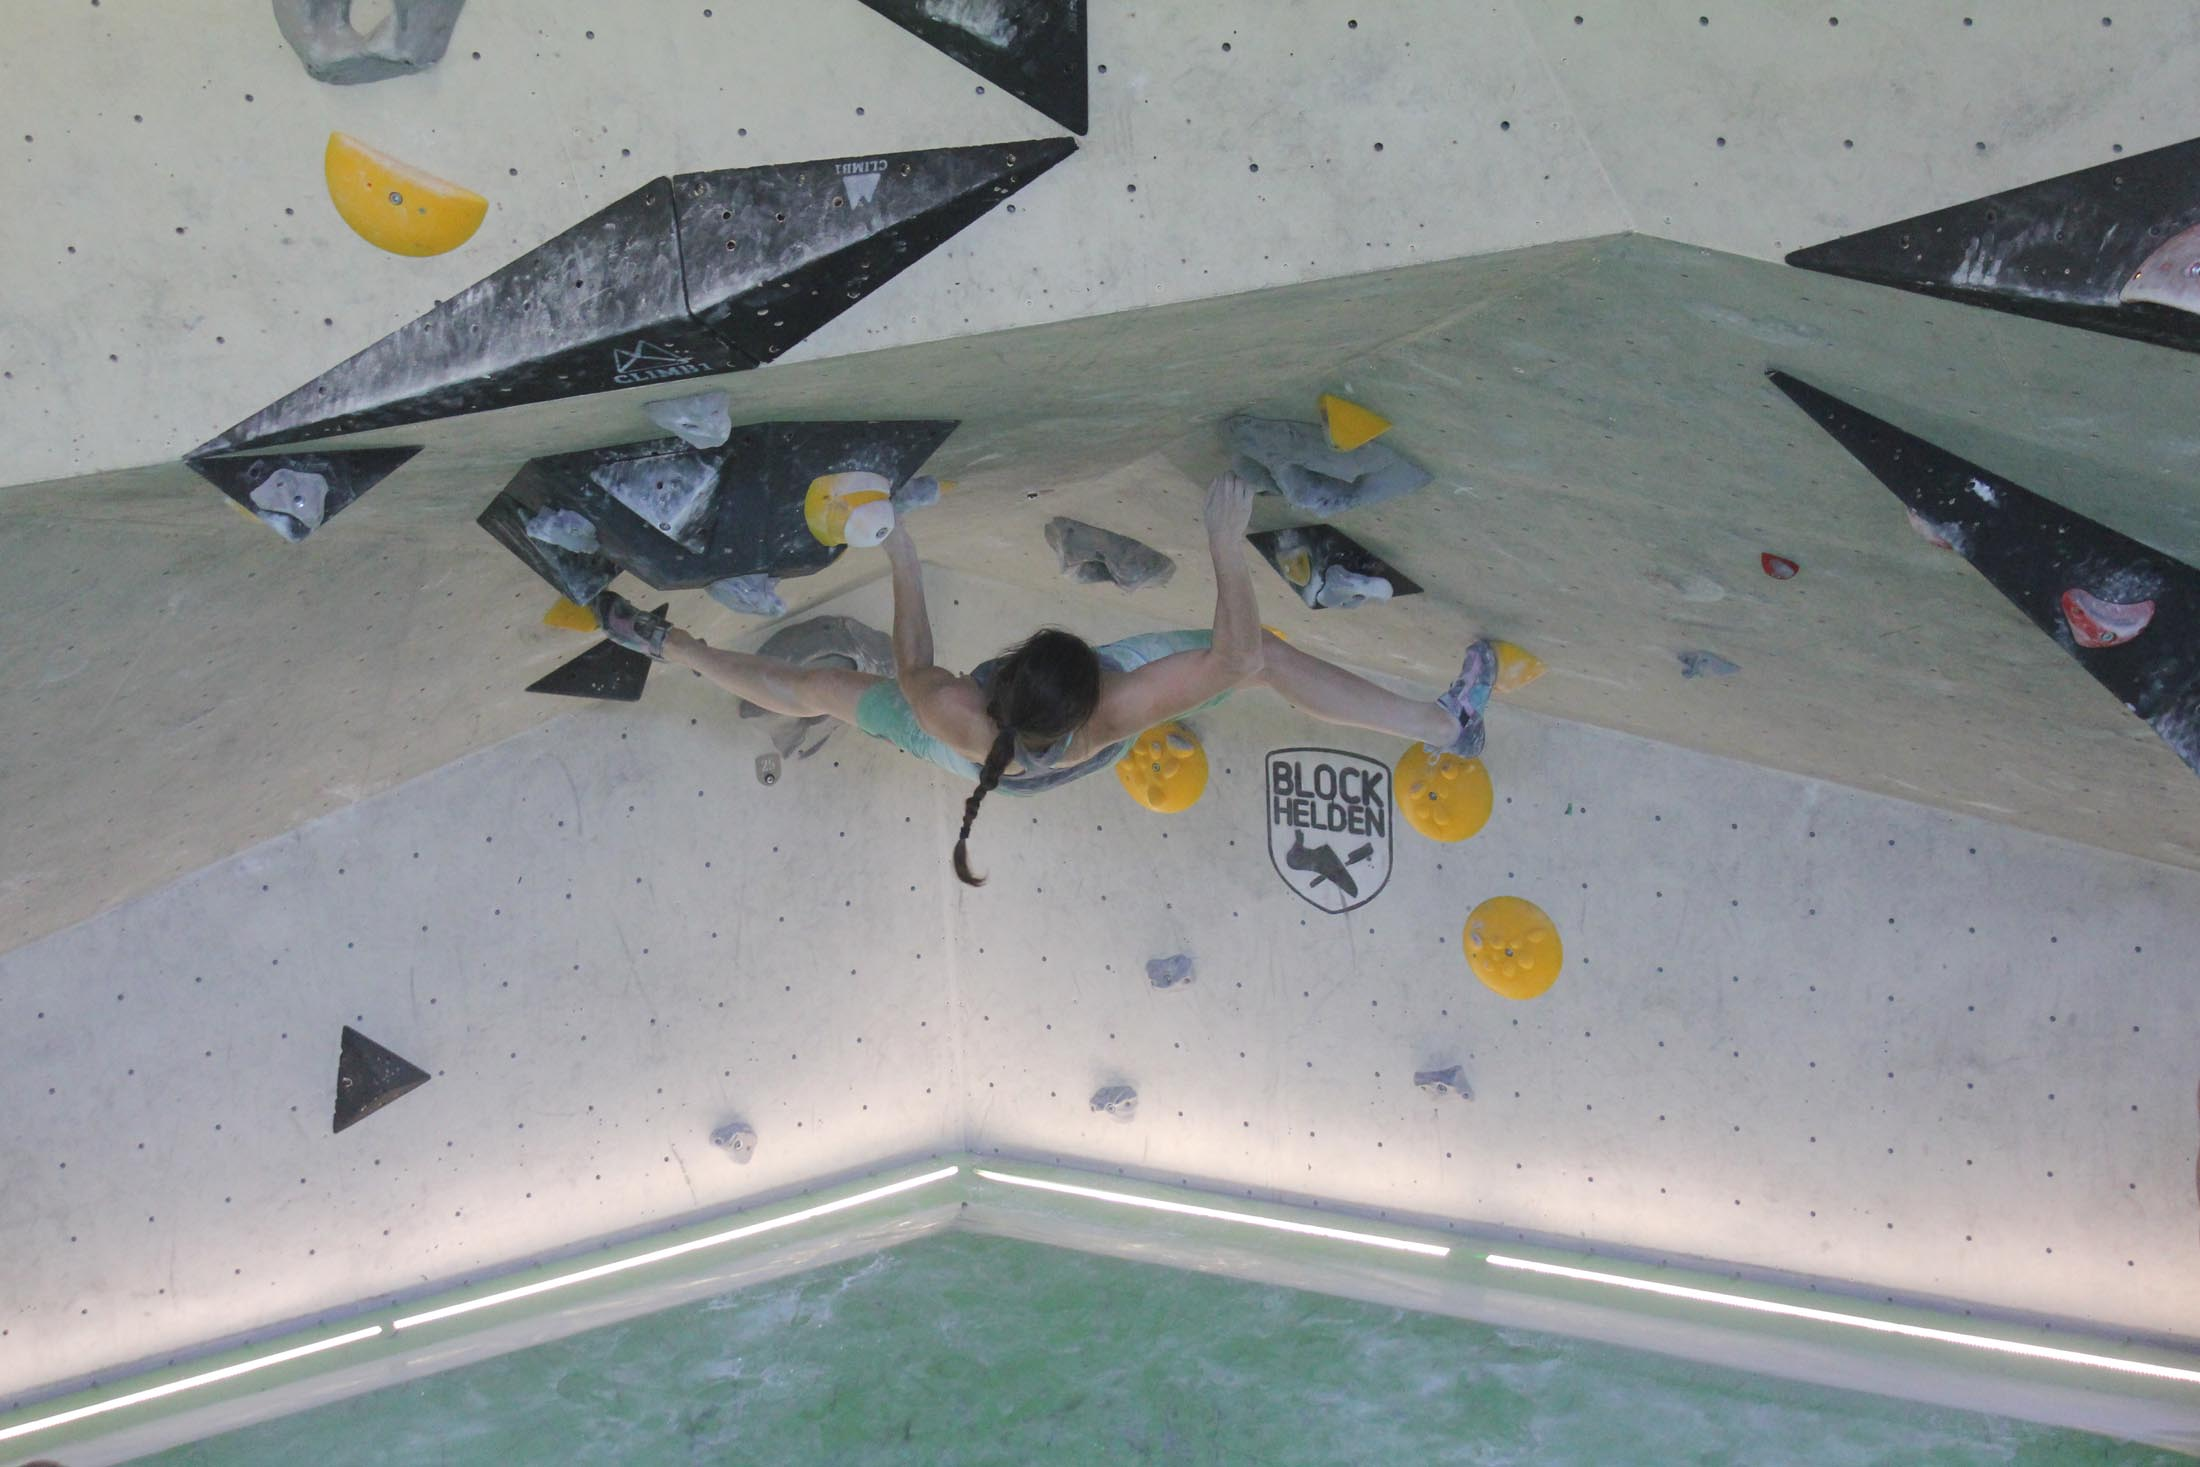 Quali, internationaler bouldercup Frankenjura 2016, BLOCKHELDEN Erlangen, Mammut, Bergfreunde.de, Boulderwettkampf07092016307